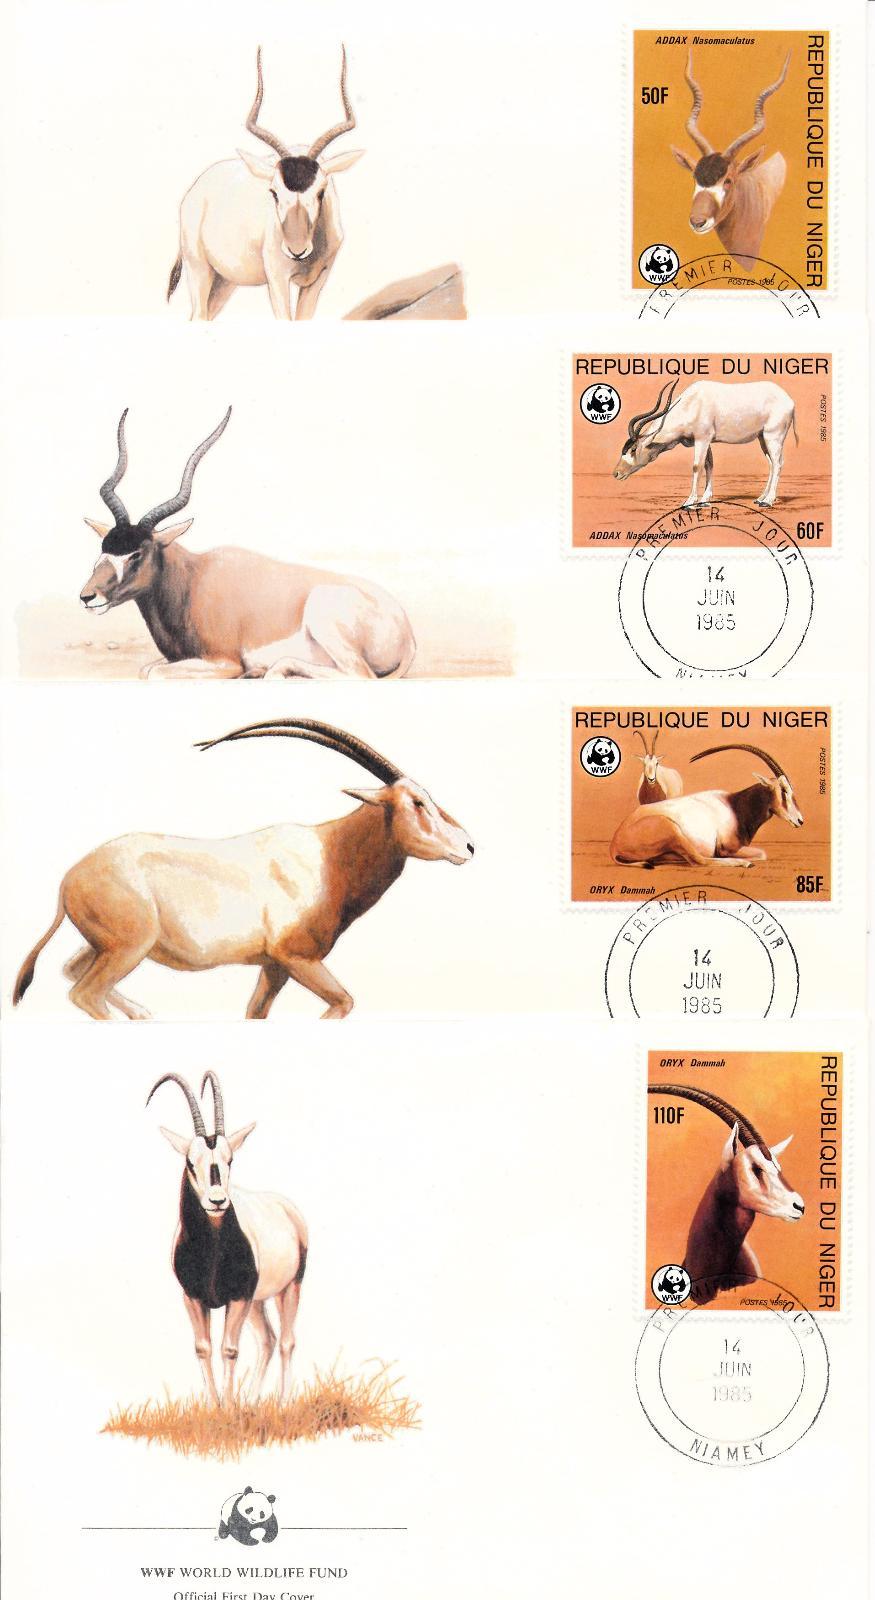 54185] Niger 1985 Wild animals Mammals WWF Antelopes Oryx FDC 4 covers |  eBay